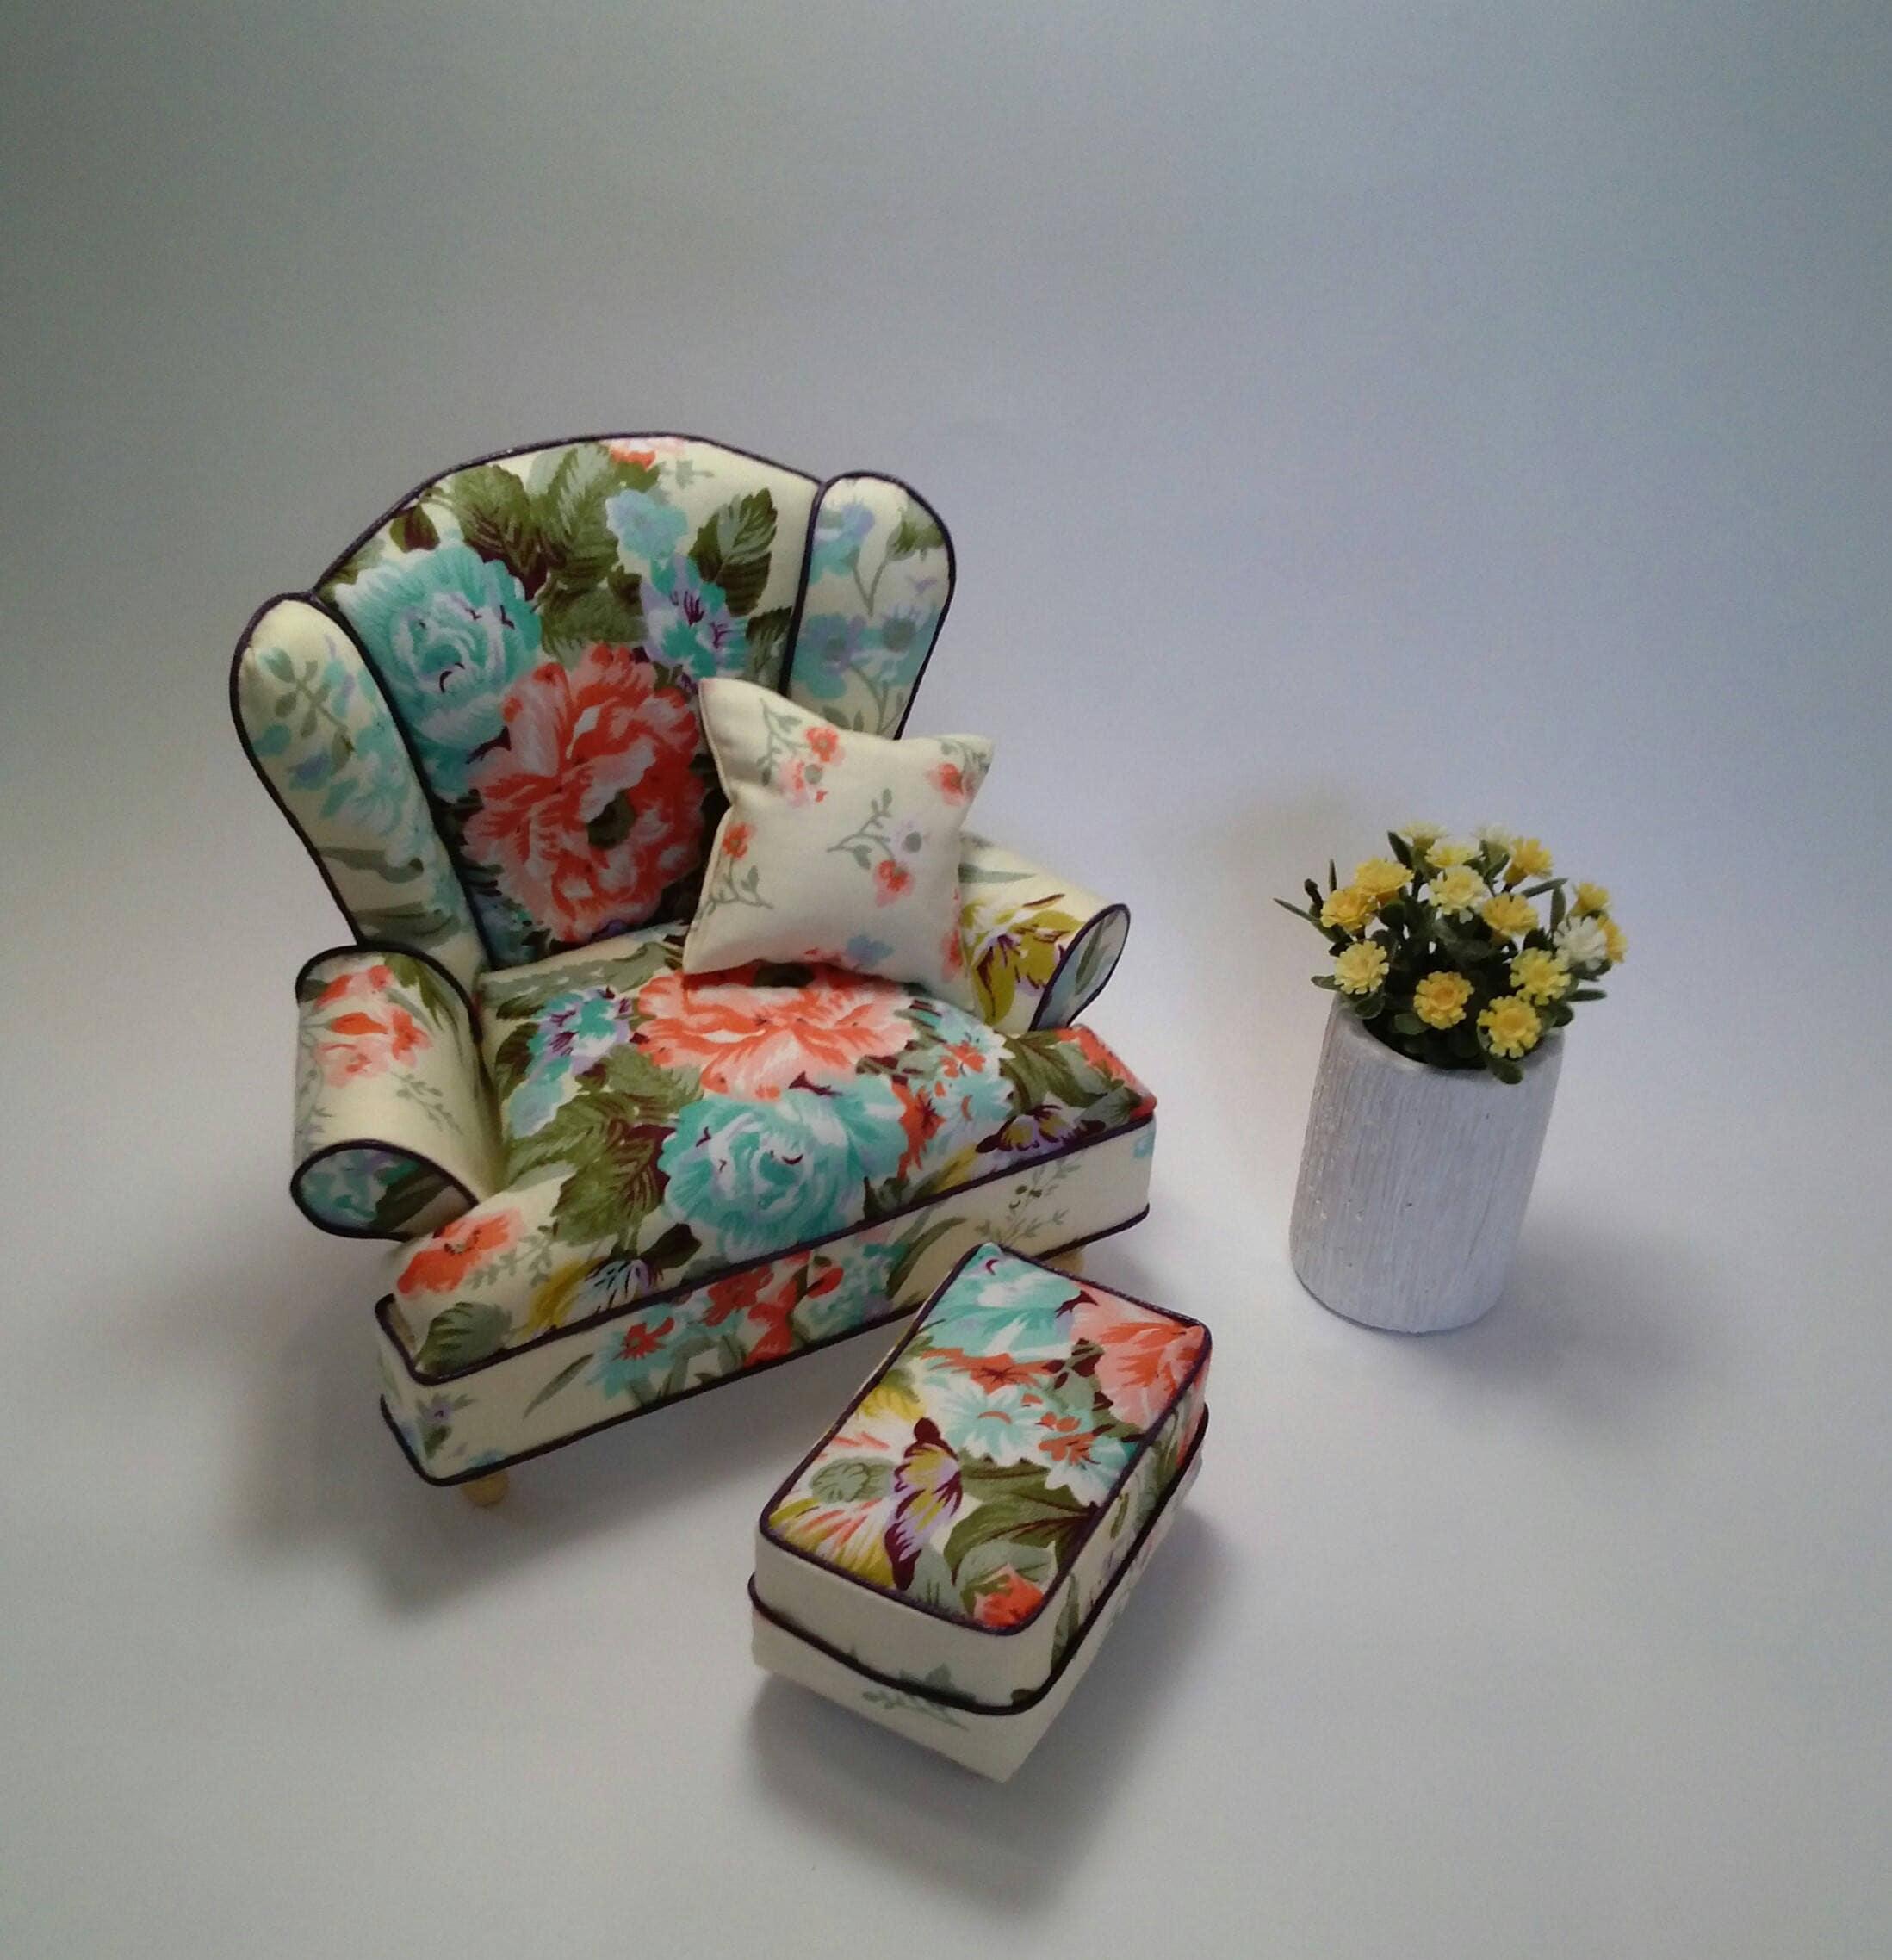 living room furniture sofa for dolls 12 inch dolls